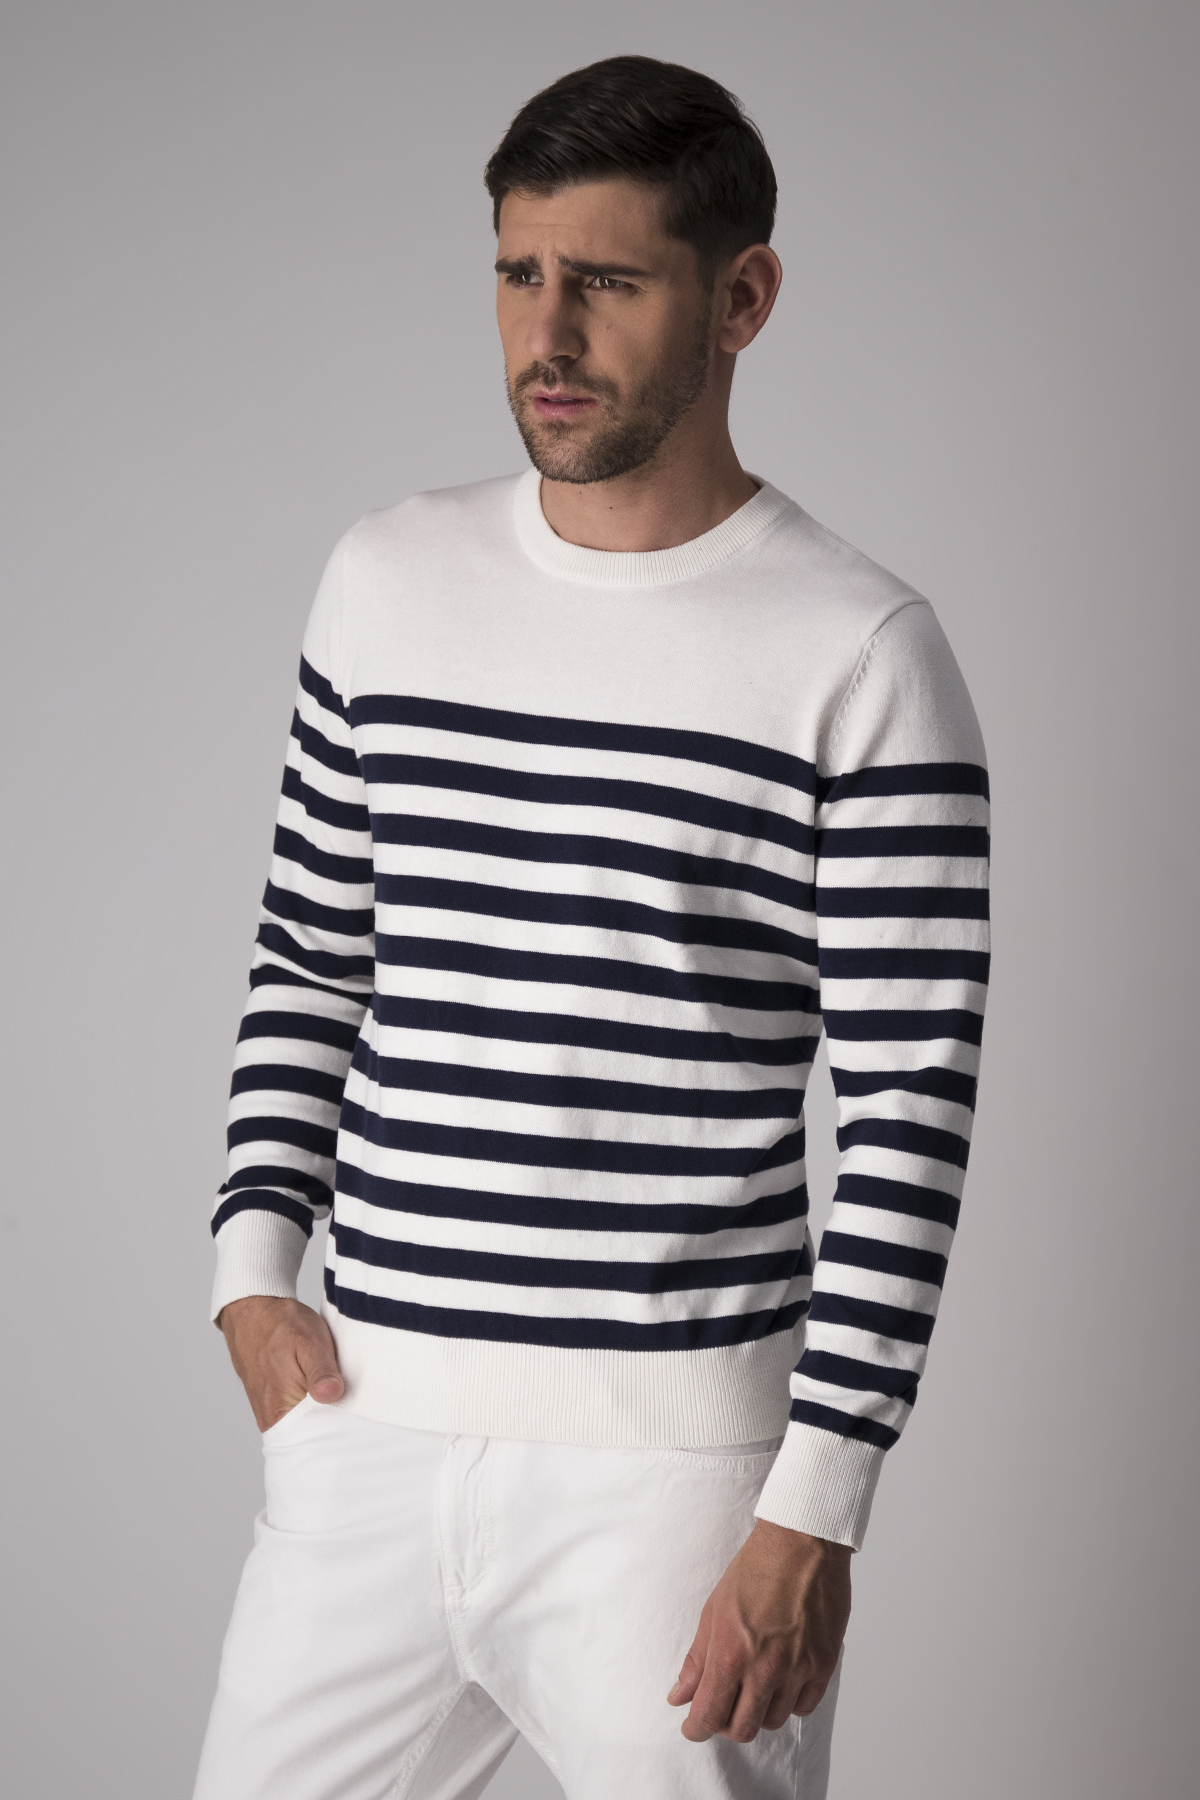 Suéter tipo nautico Robert's Classic